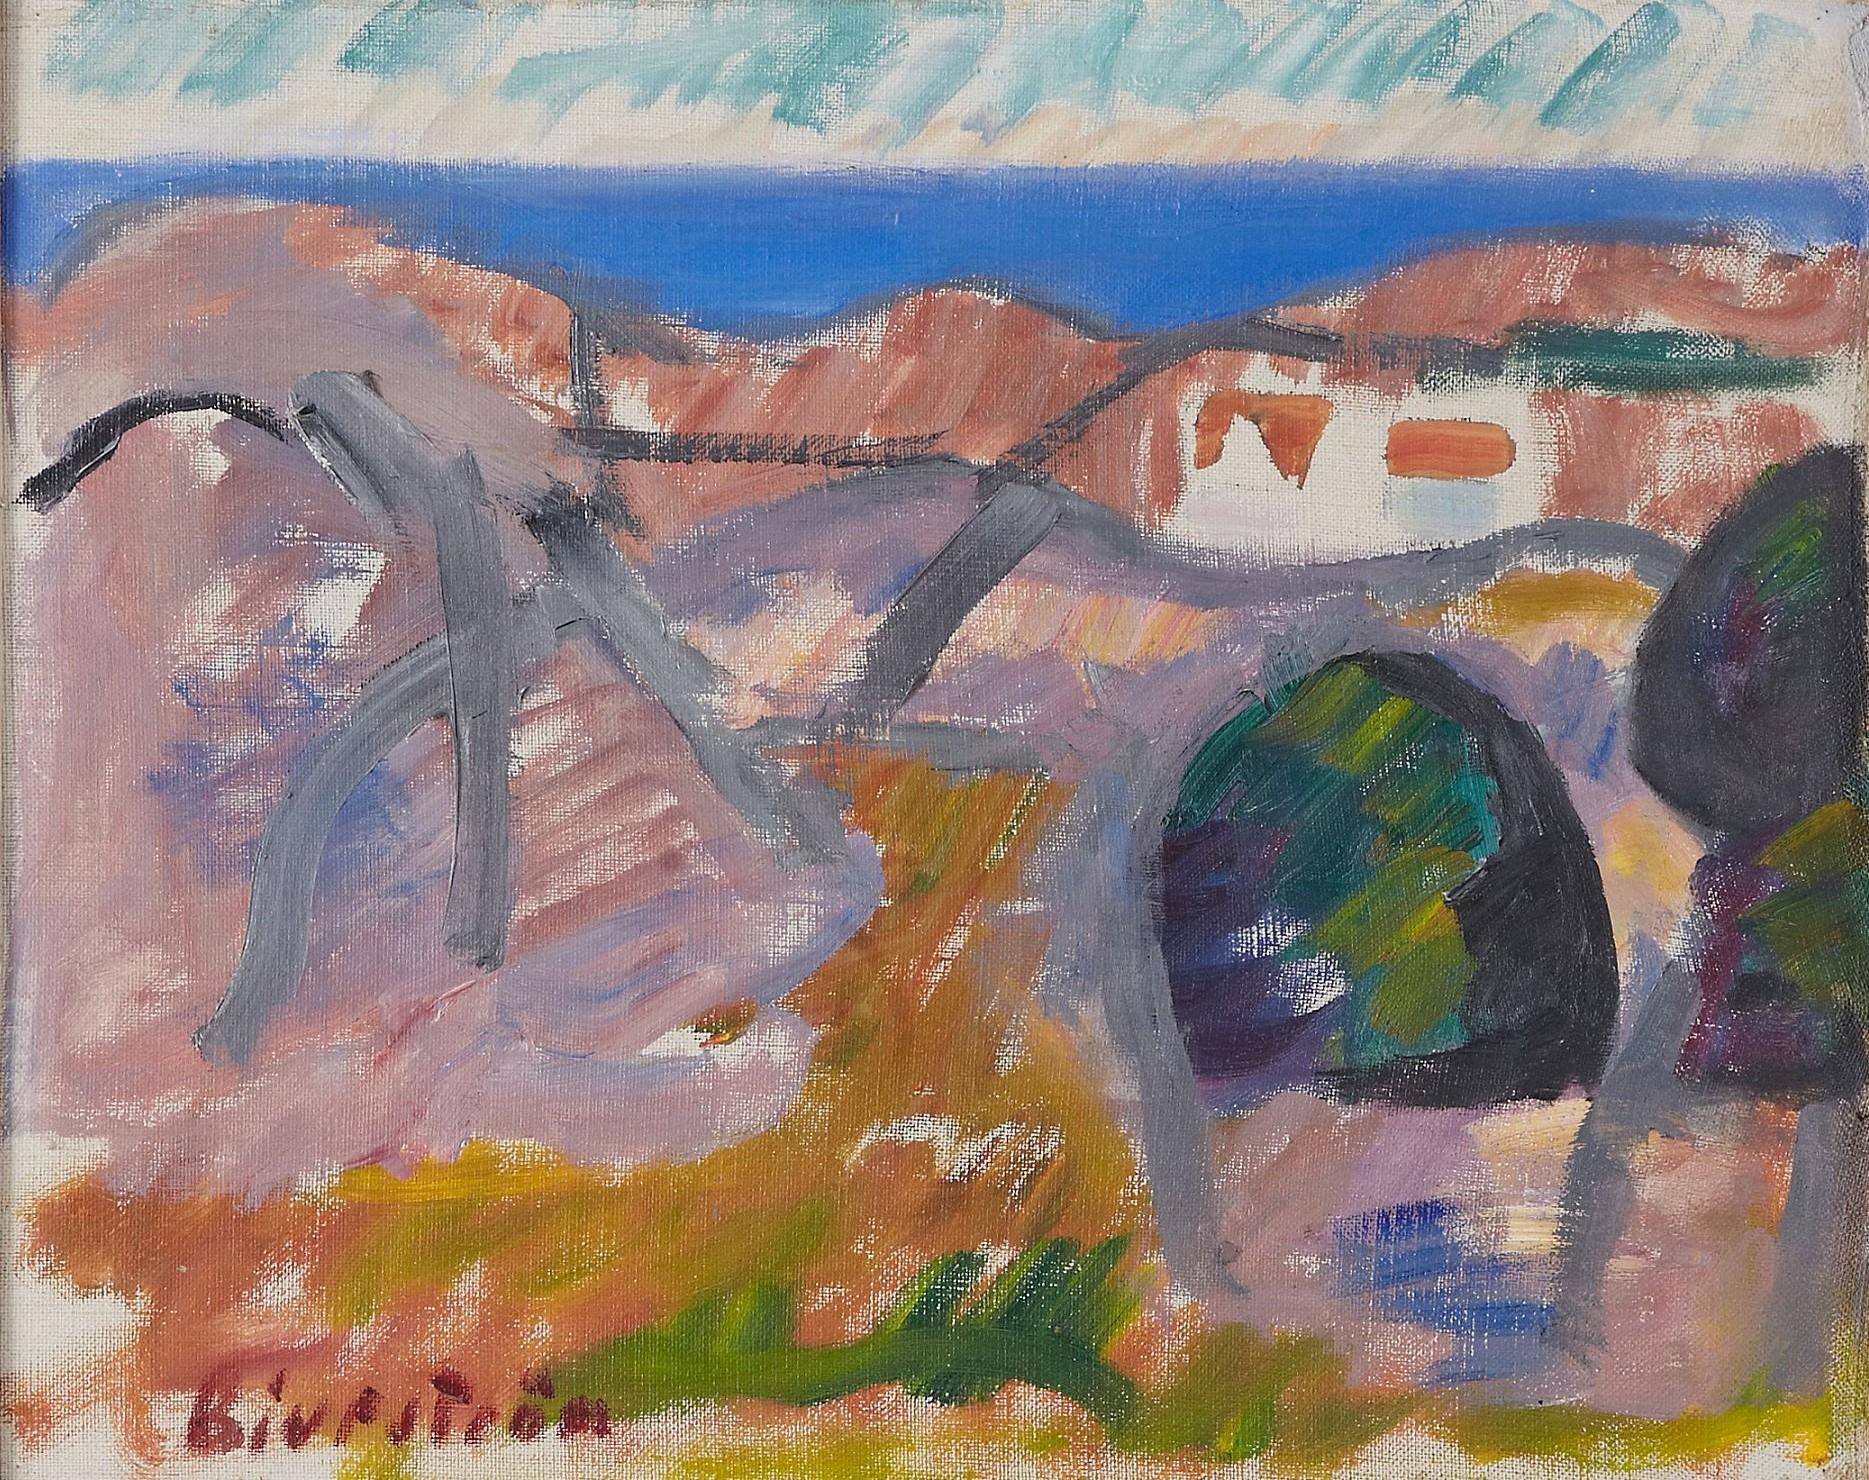 Bohuslän Coastline by  Tor Bjurström - Masterpiece Online